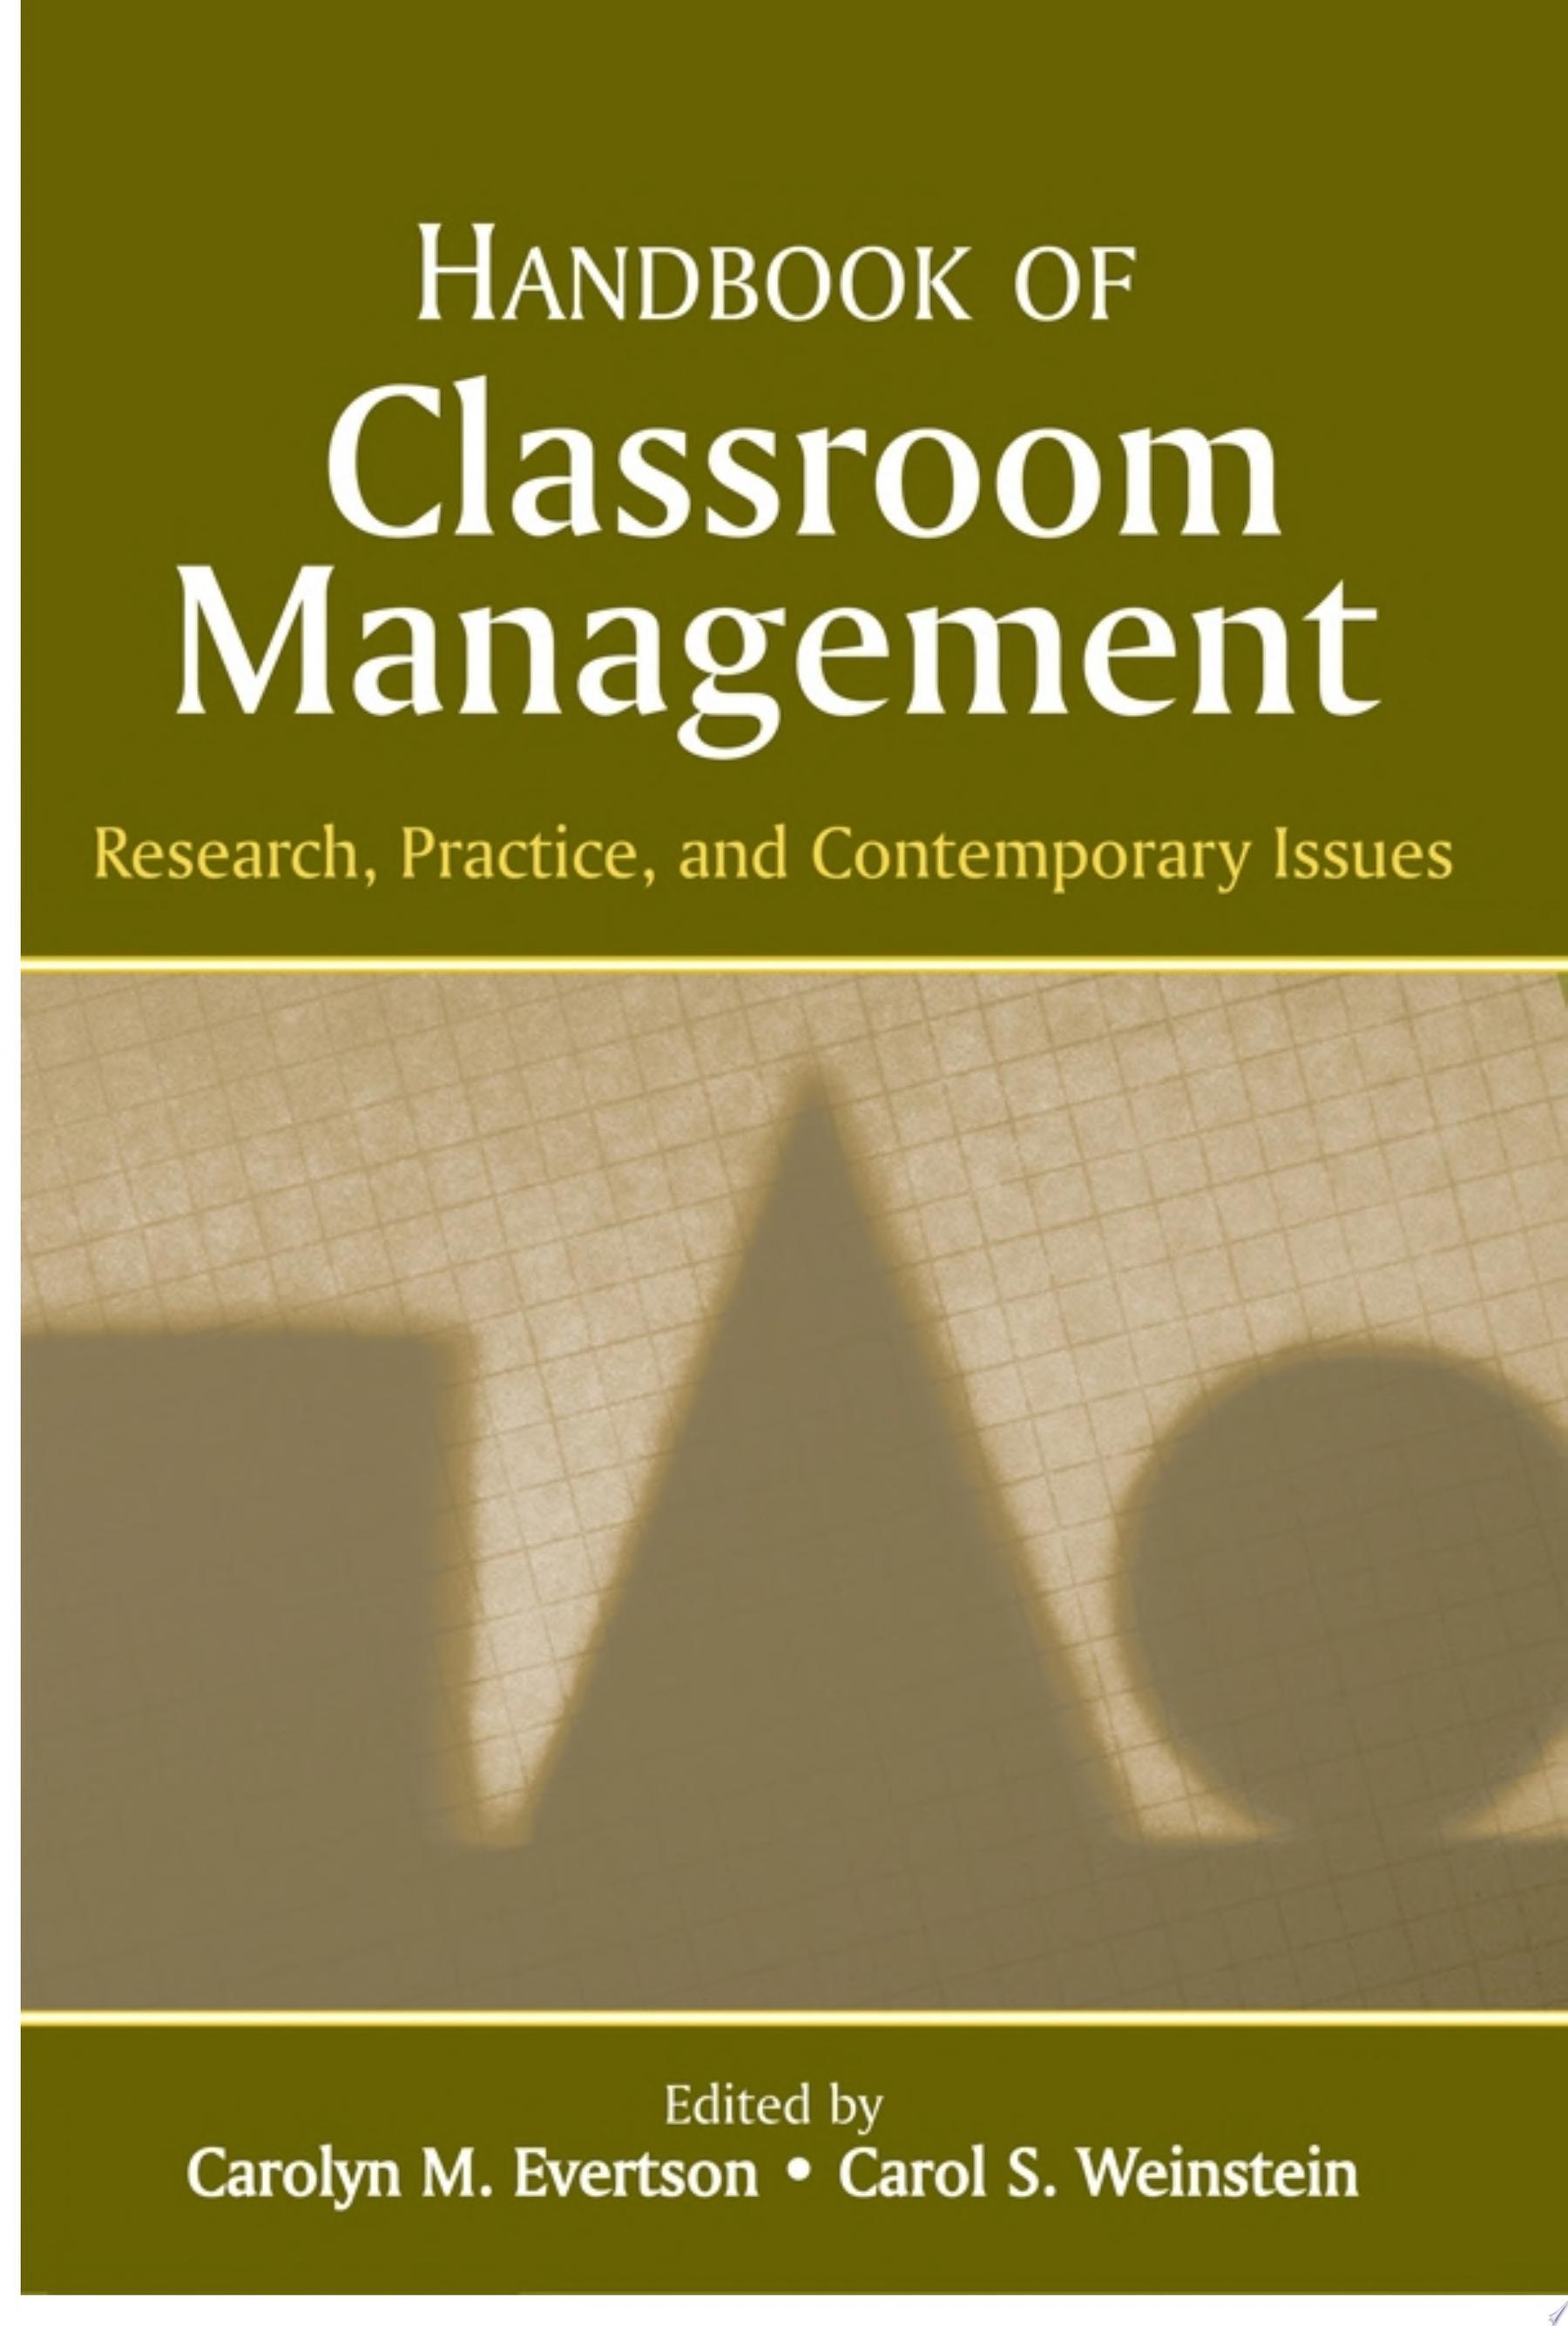 Handbook of Classroom Management